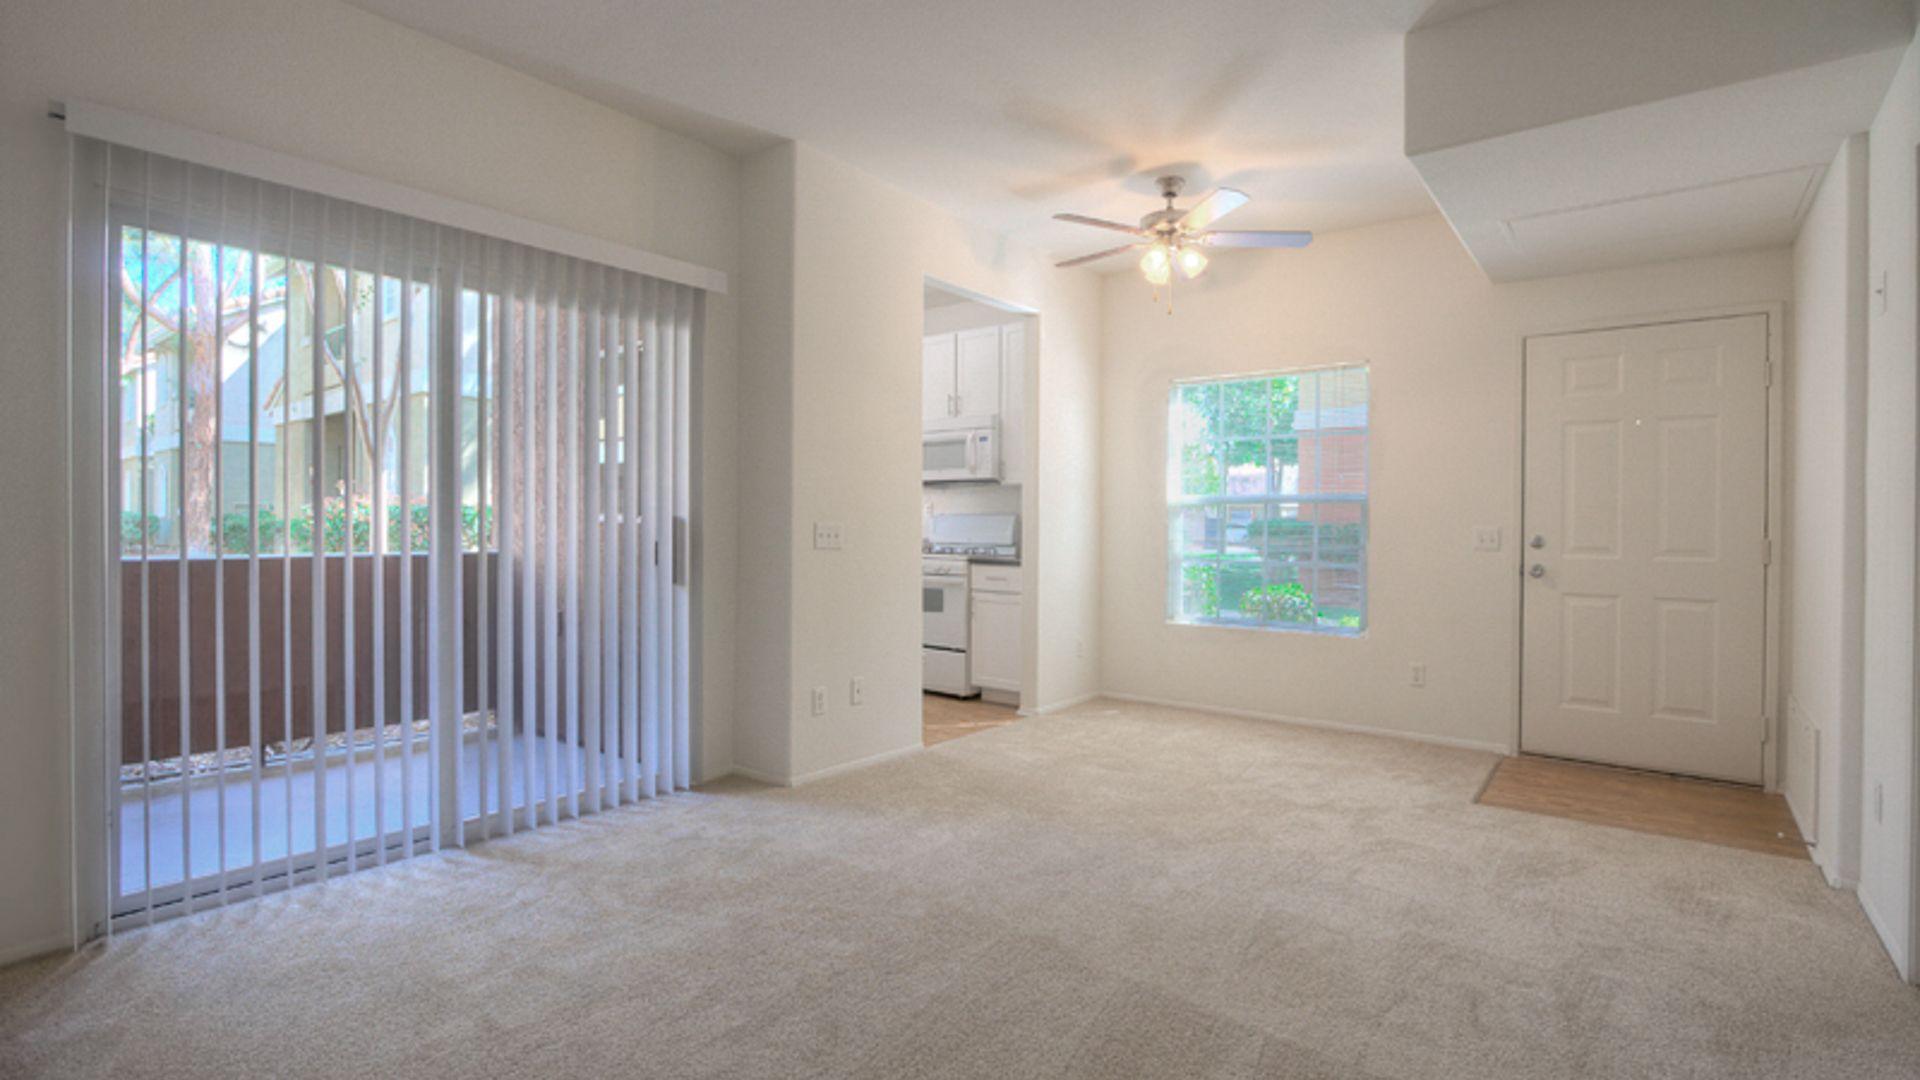 Ridgewood Village Apartments - Living Room and Balcony